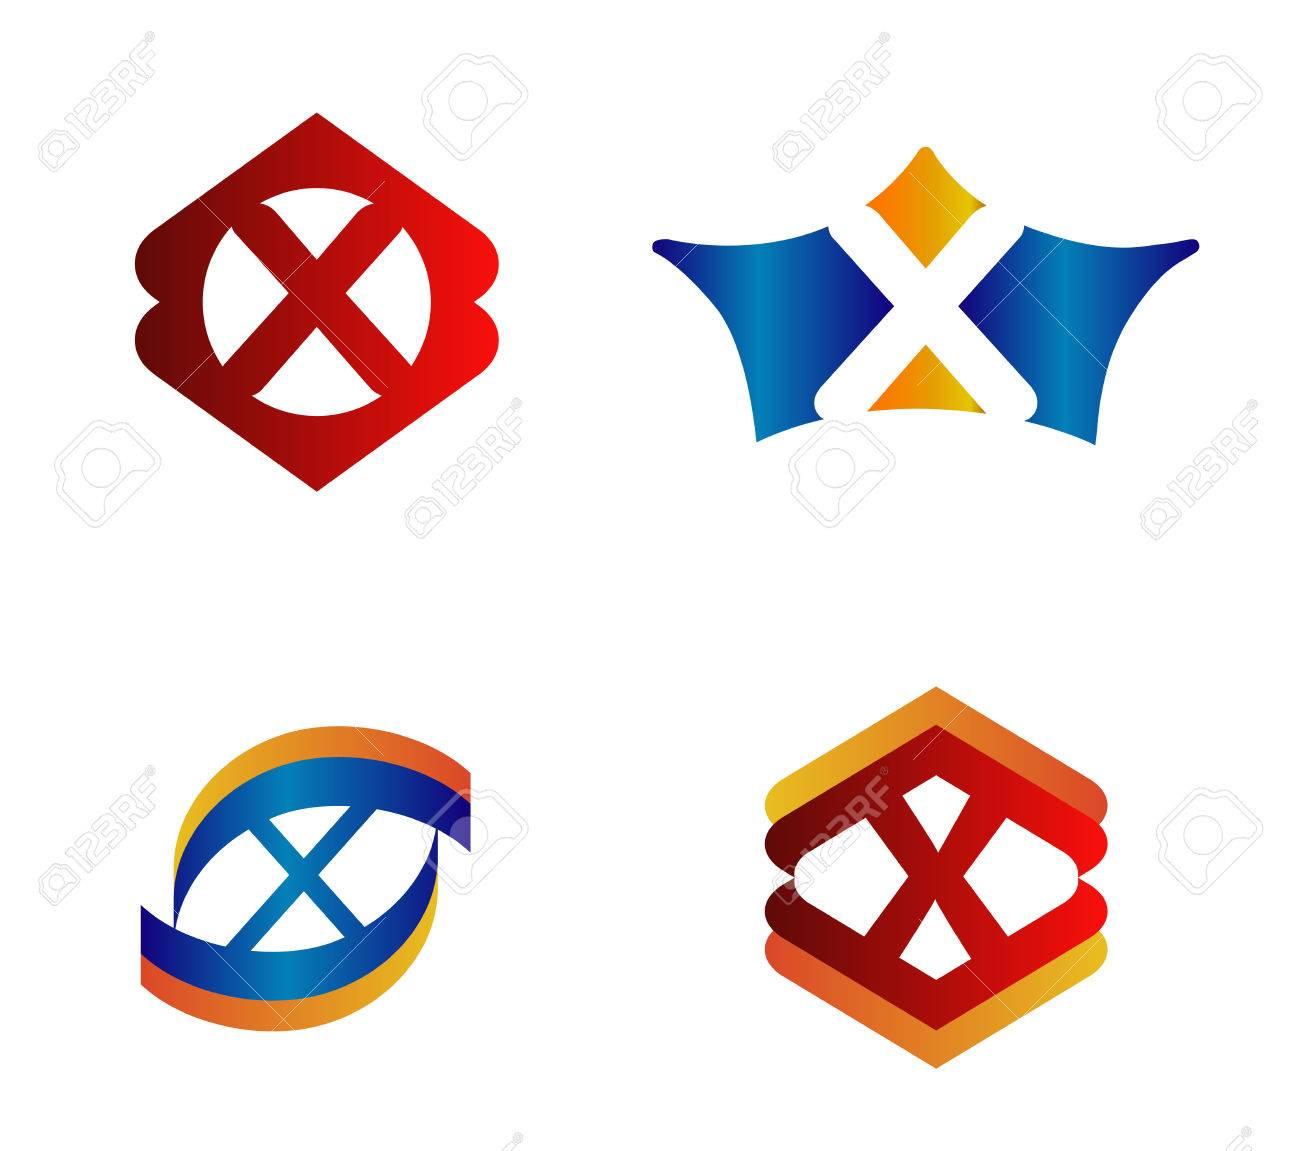 letter x logo design concepts set alphabetical royalty letter x logo design concepts set alphabetical stock vector 44399997